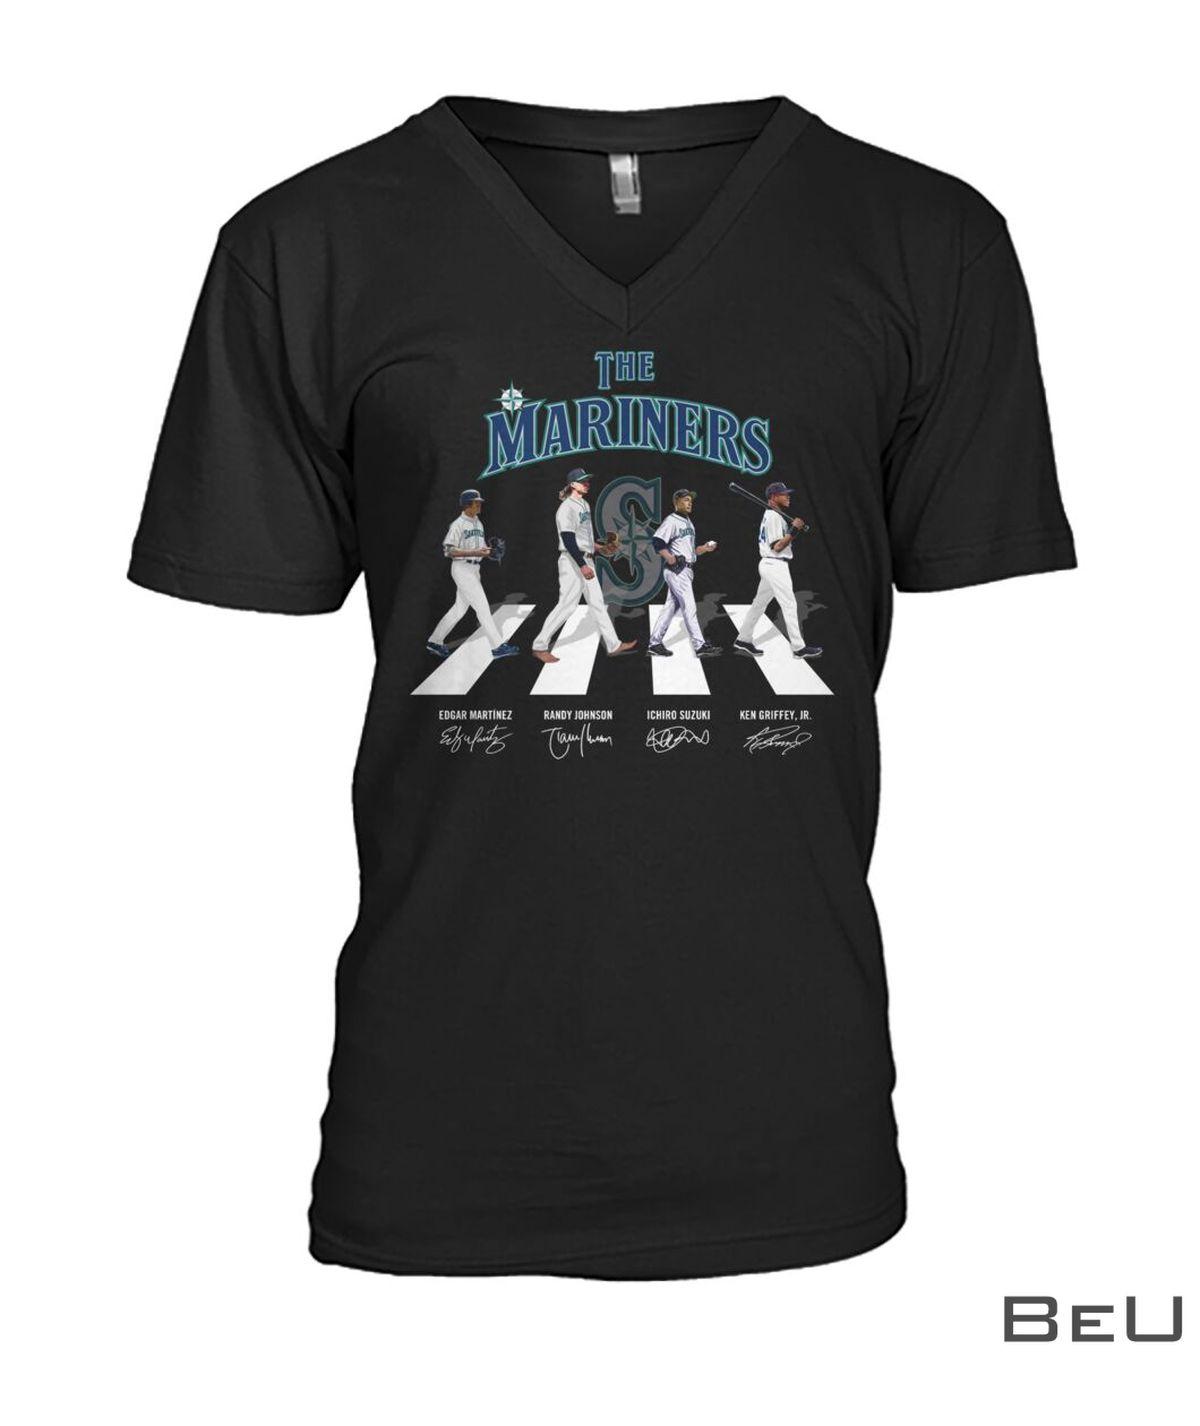 The Mariners Edgar Martinez Randy Johnson Ichiro Suzuki Ken Griffey Jr Shirtc